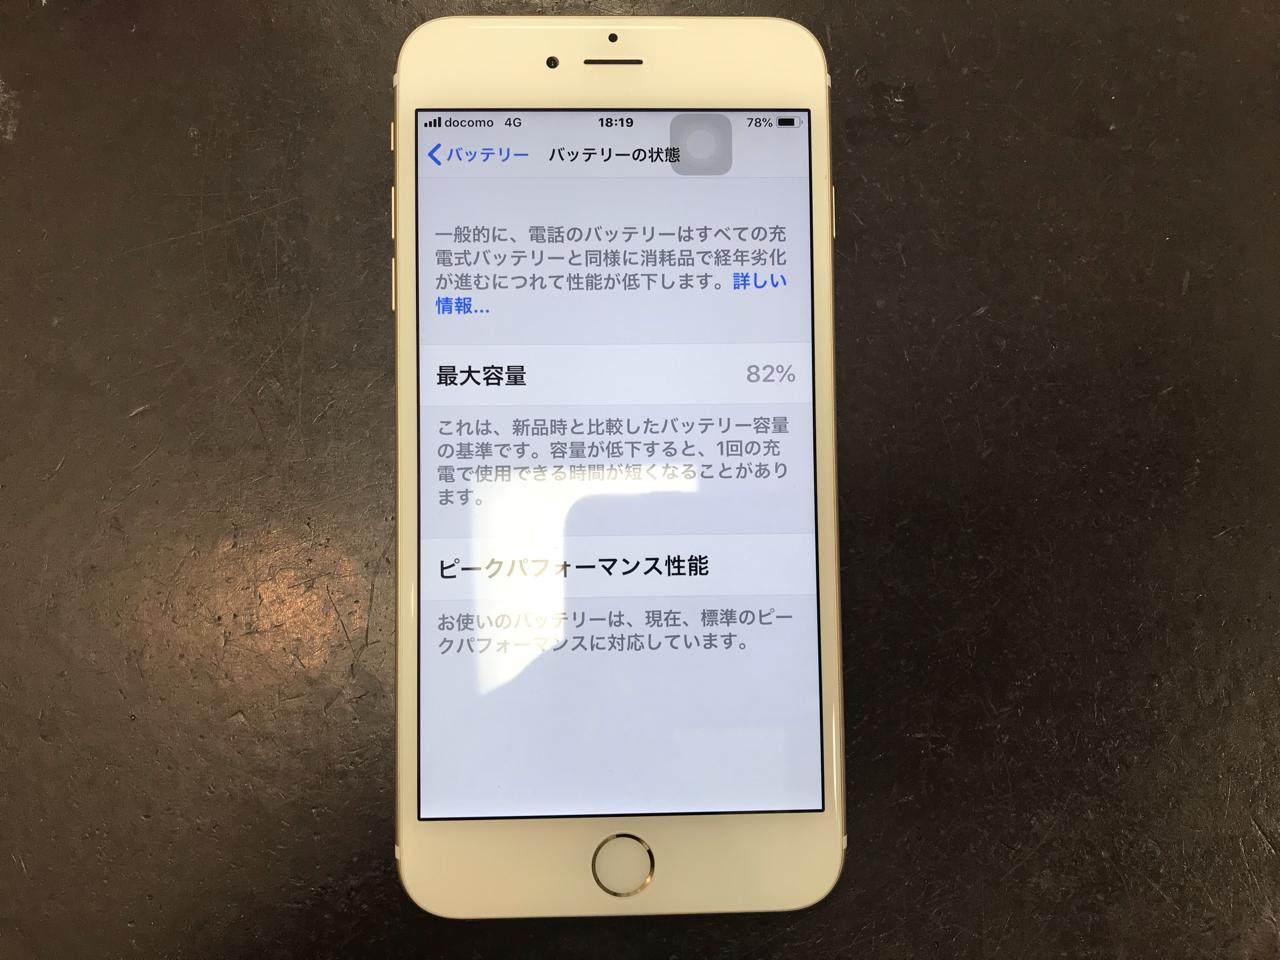 70b3c0f5-5e6e-4166-85f3-deb51068ae9d_1547024455_-1318343648 かなりバッテリーが劣化したiPhone6SPlusのバッテリー交換をしました!